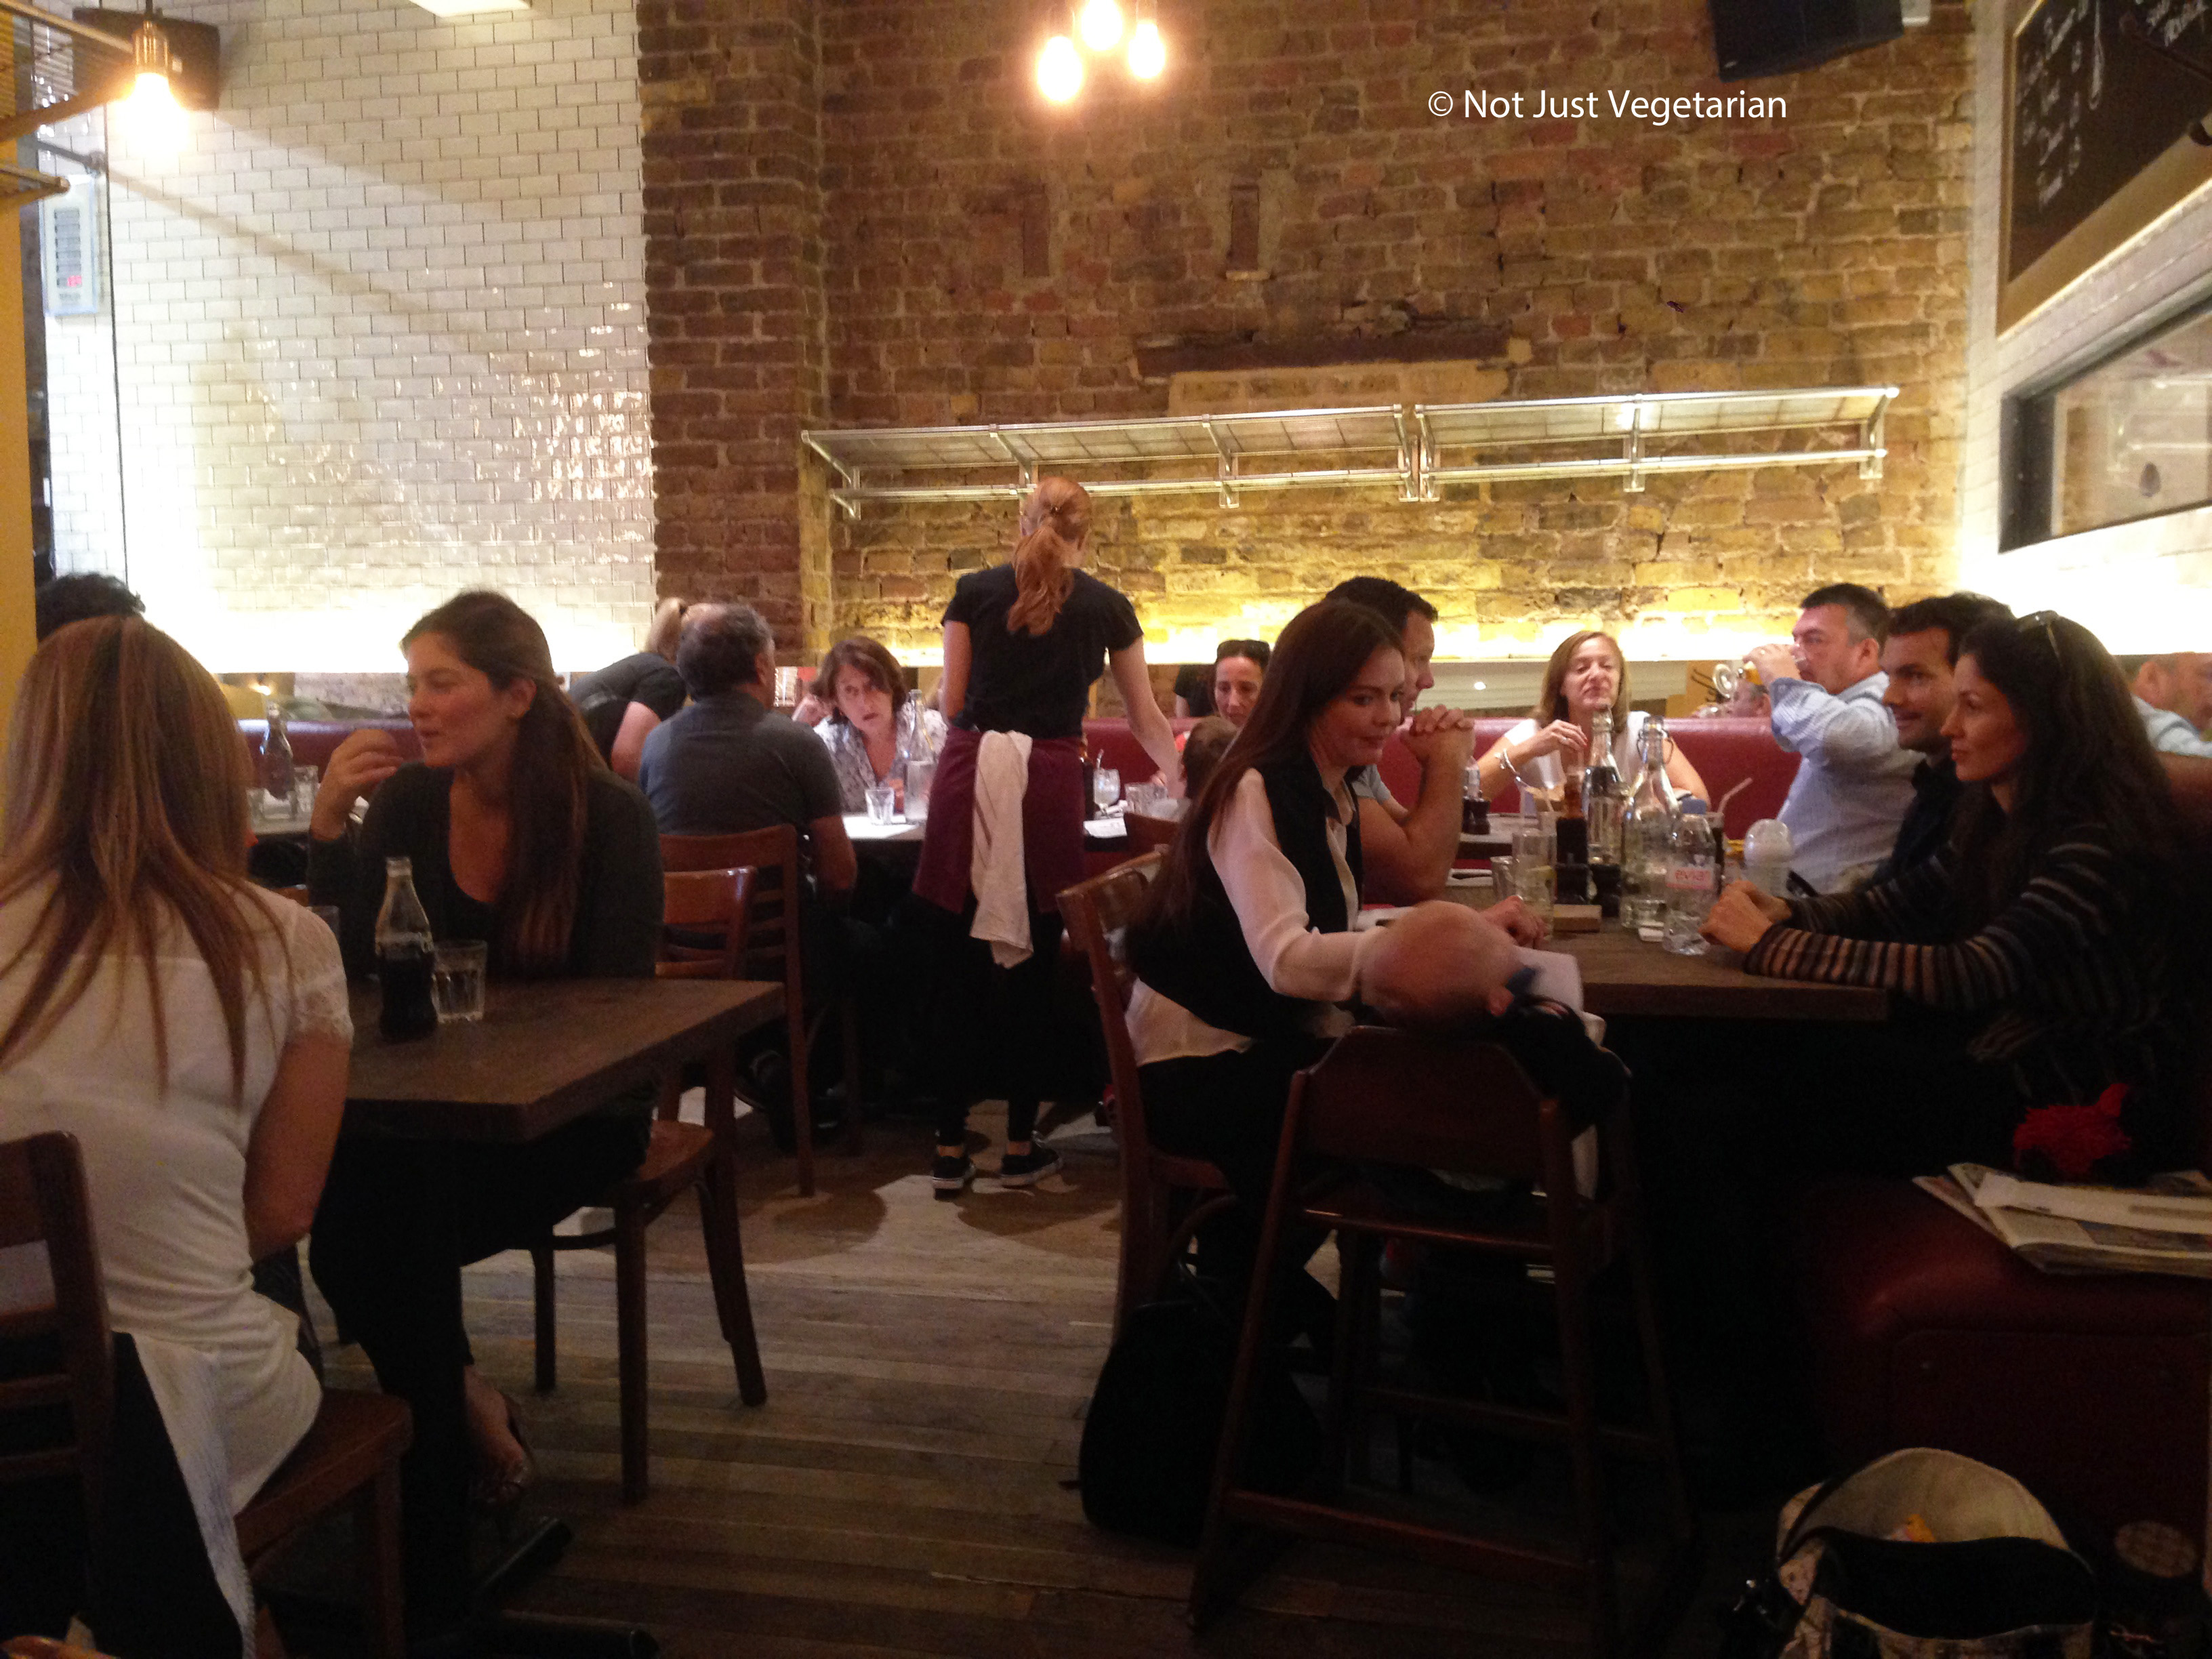 Sophie S Steakhouse In Chelsea London Not Just Vegetarian